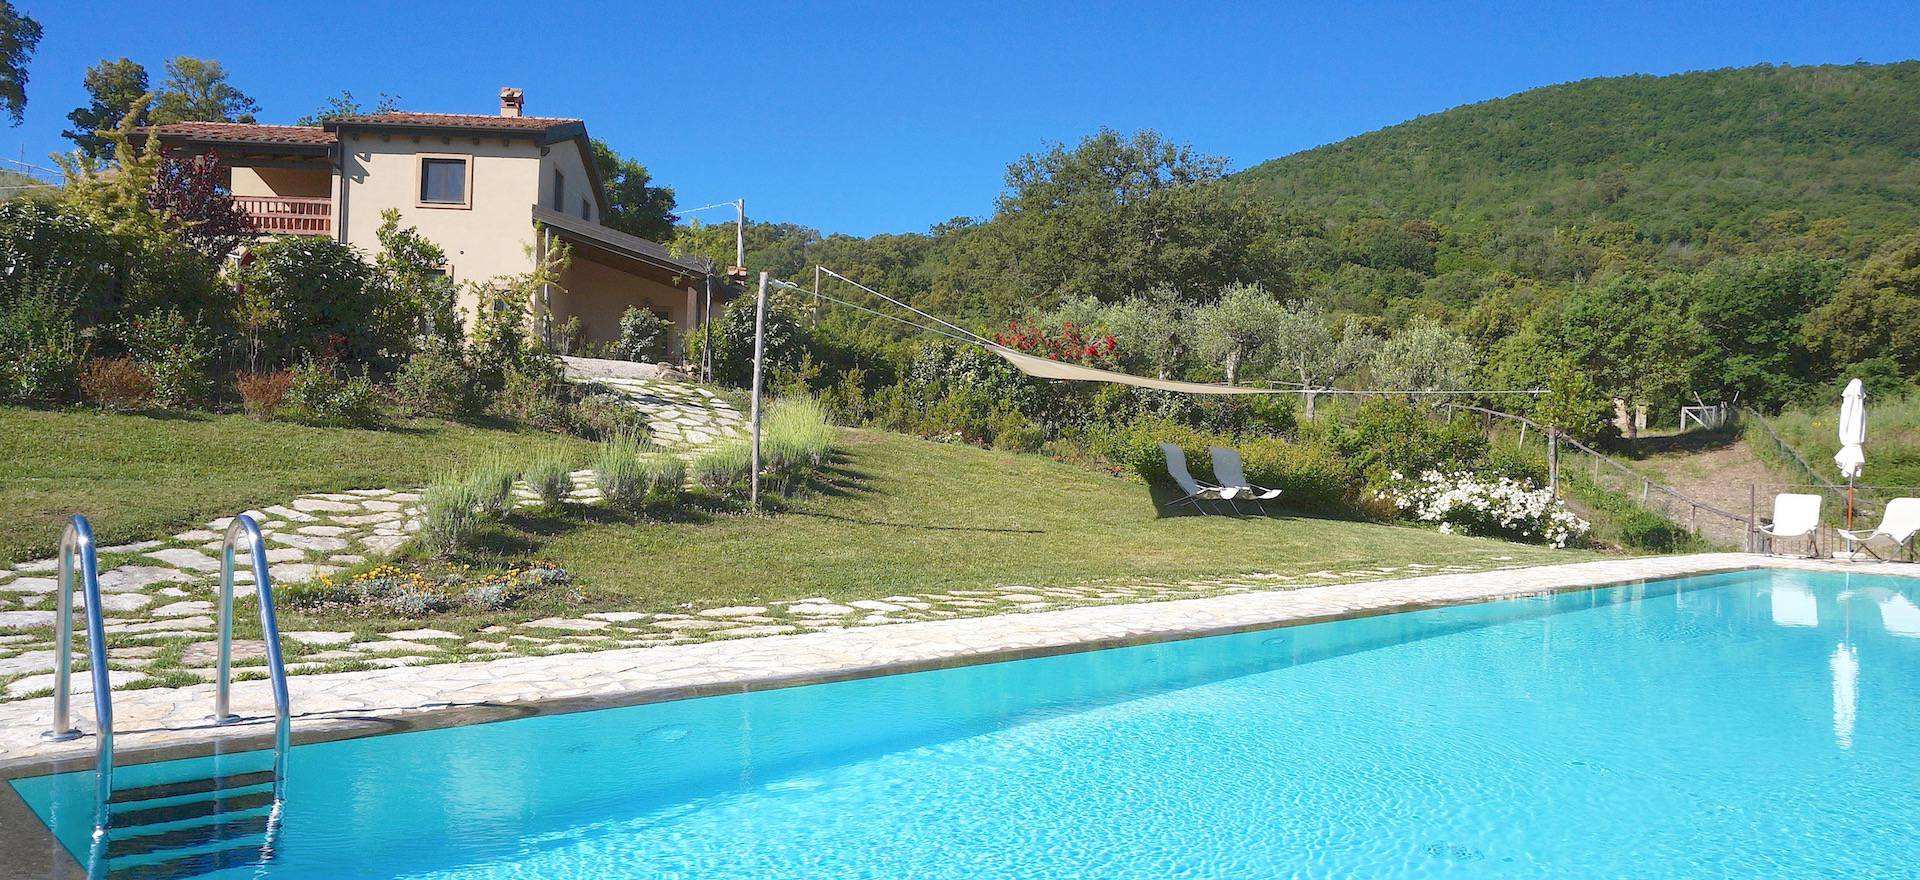 Agriturismo Toscana Agriturismo con case di lusso su una collina in Toscana